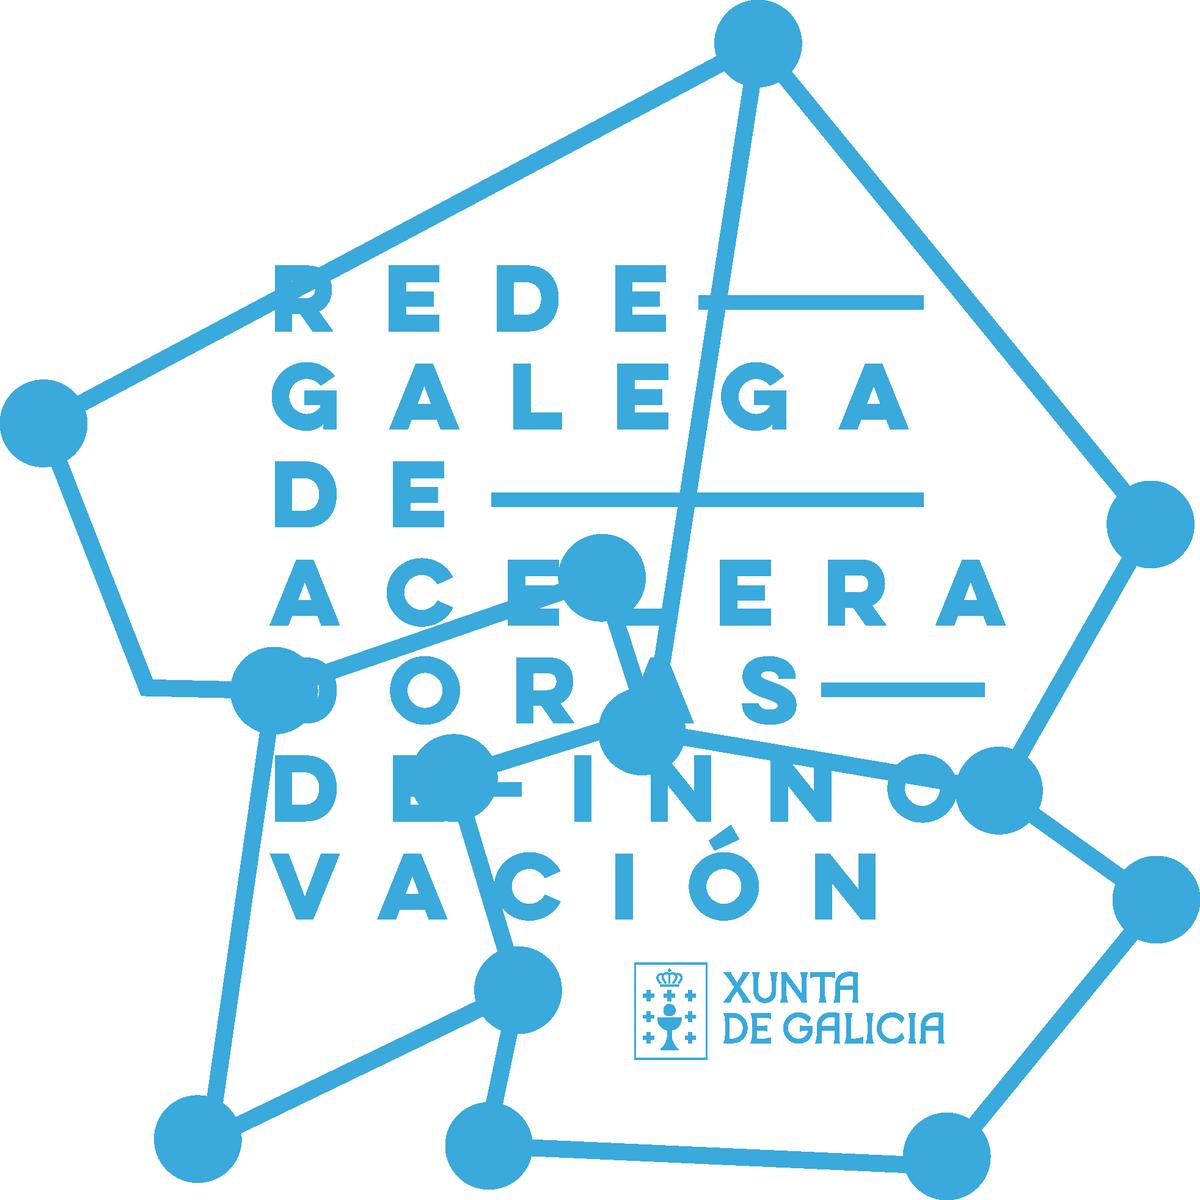 Iniciativas de aceleración de #Galicia https://t.co/46pOjmTeBQ https://t.co/TFBSpBna42